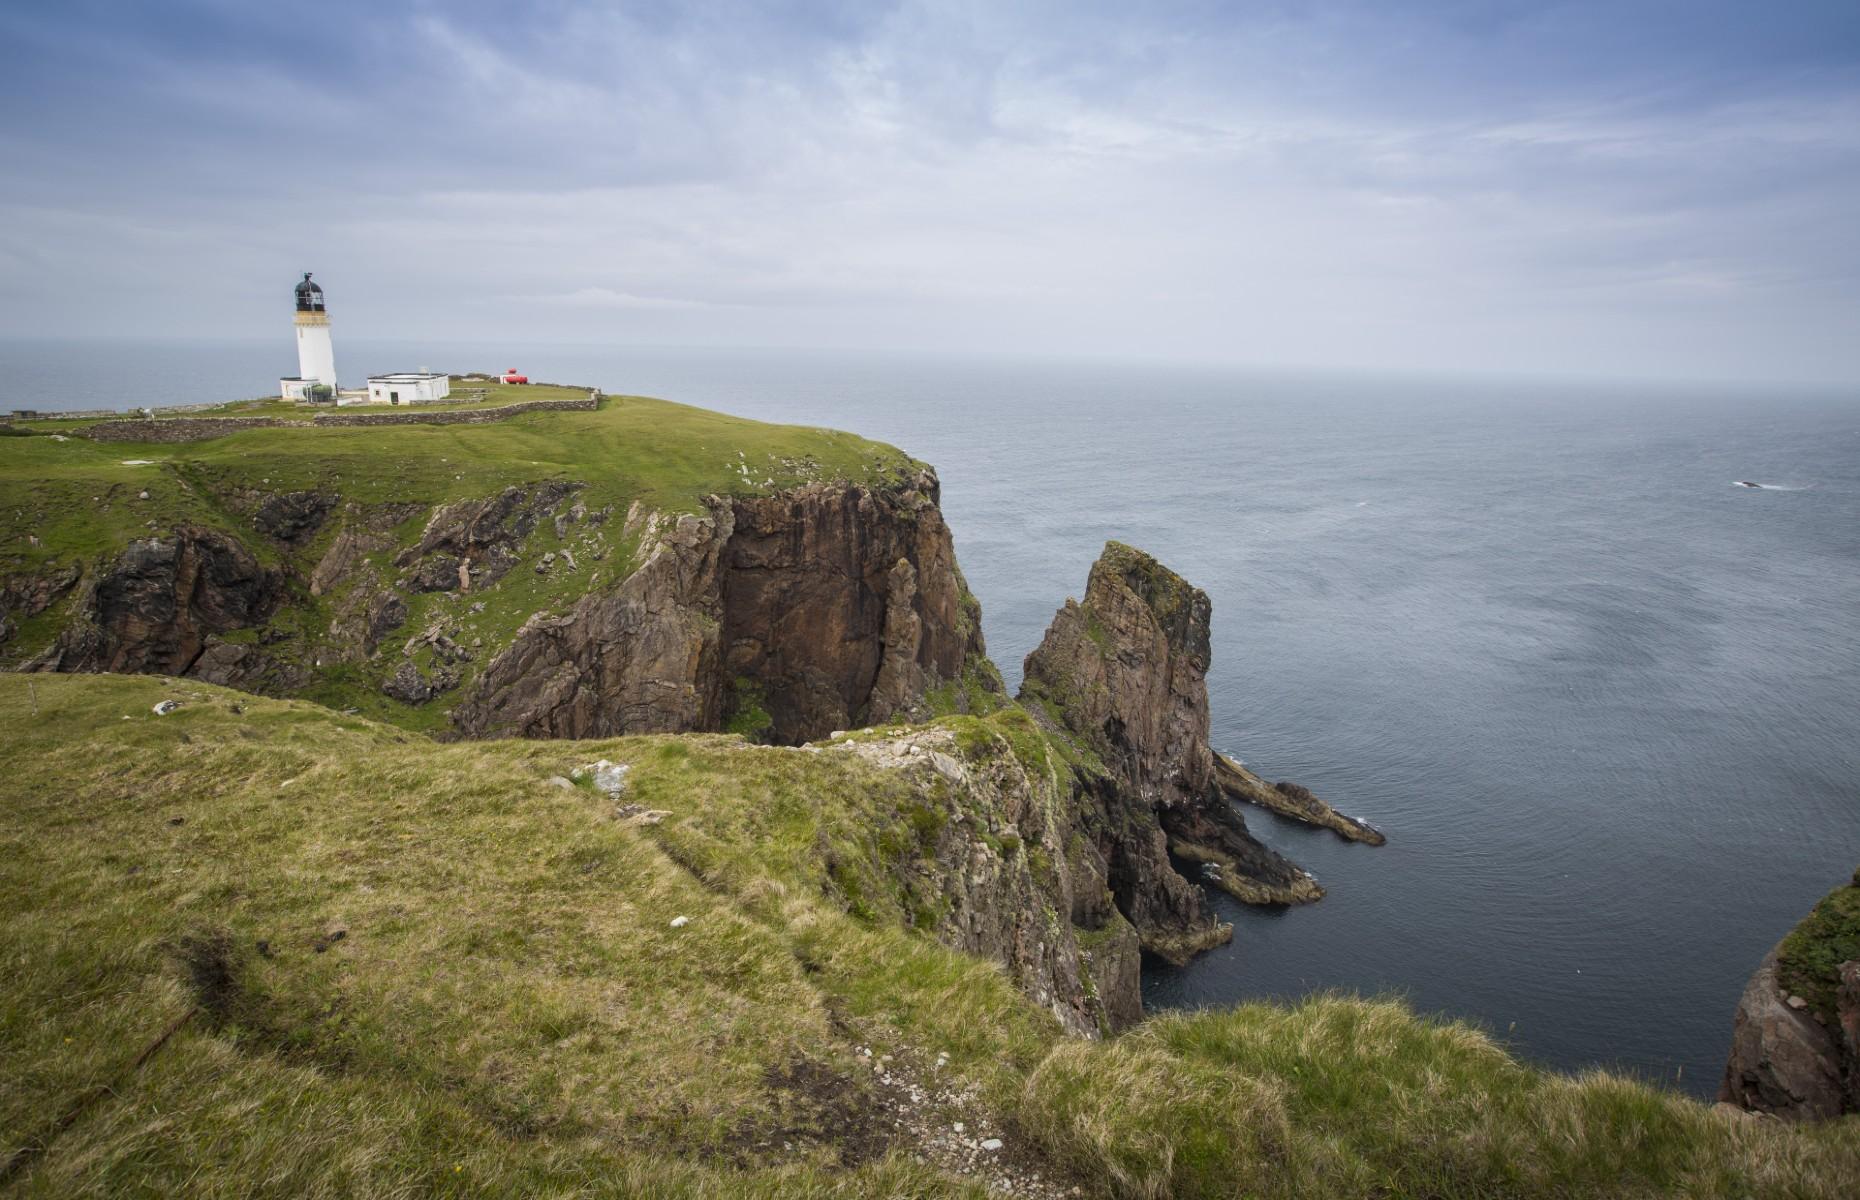 Cape Wrath (Image: Dejonckheere/Shutterstock)